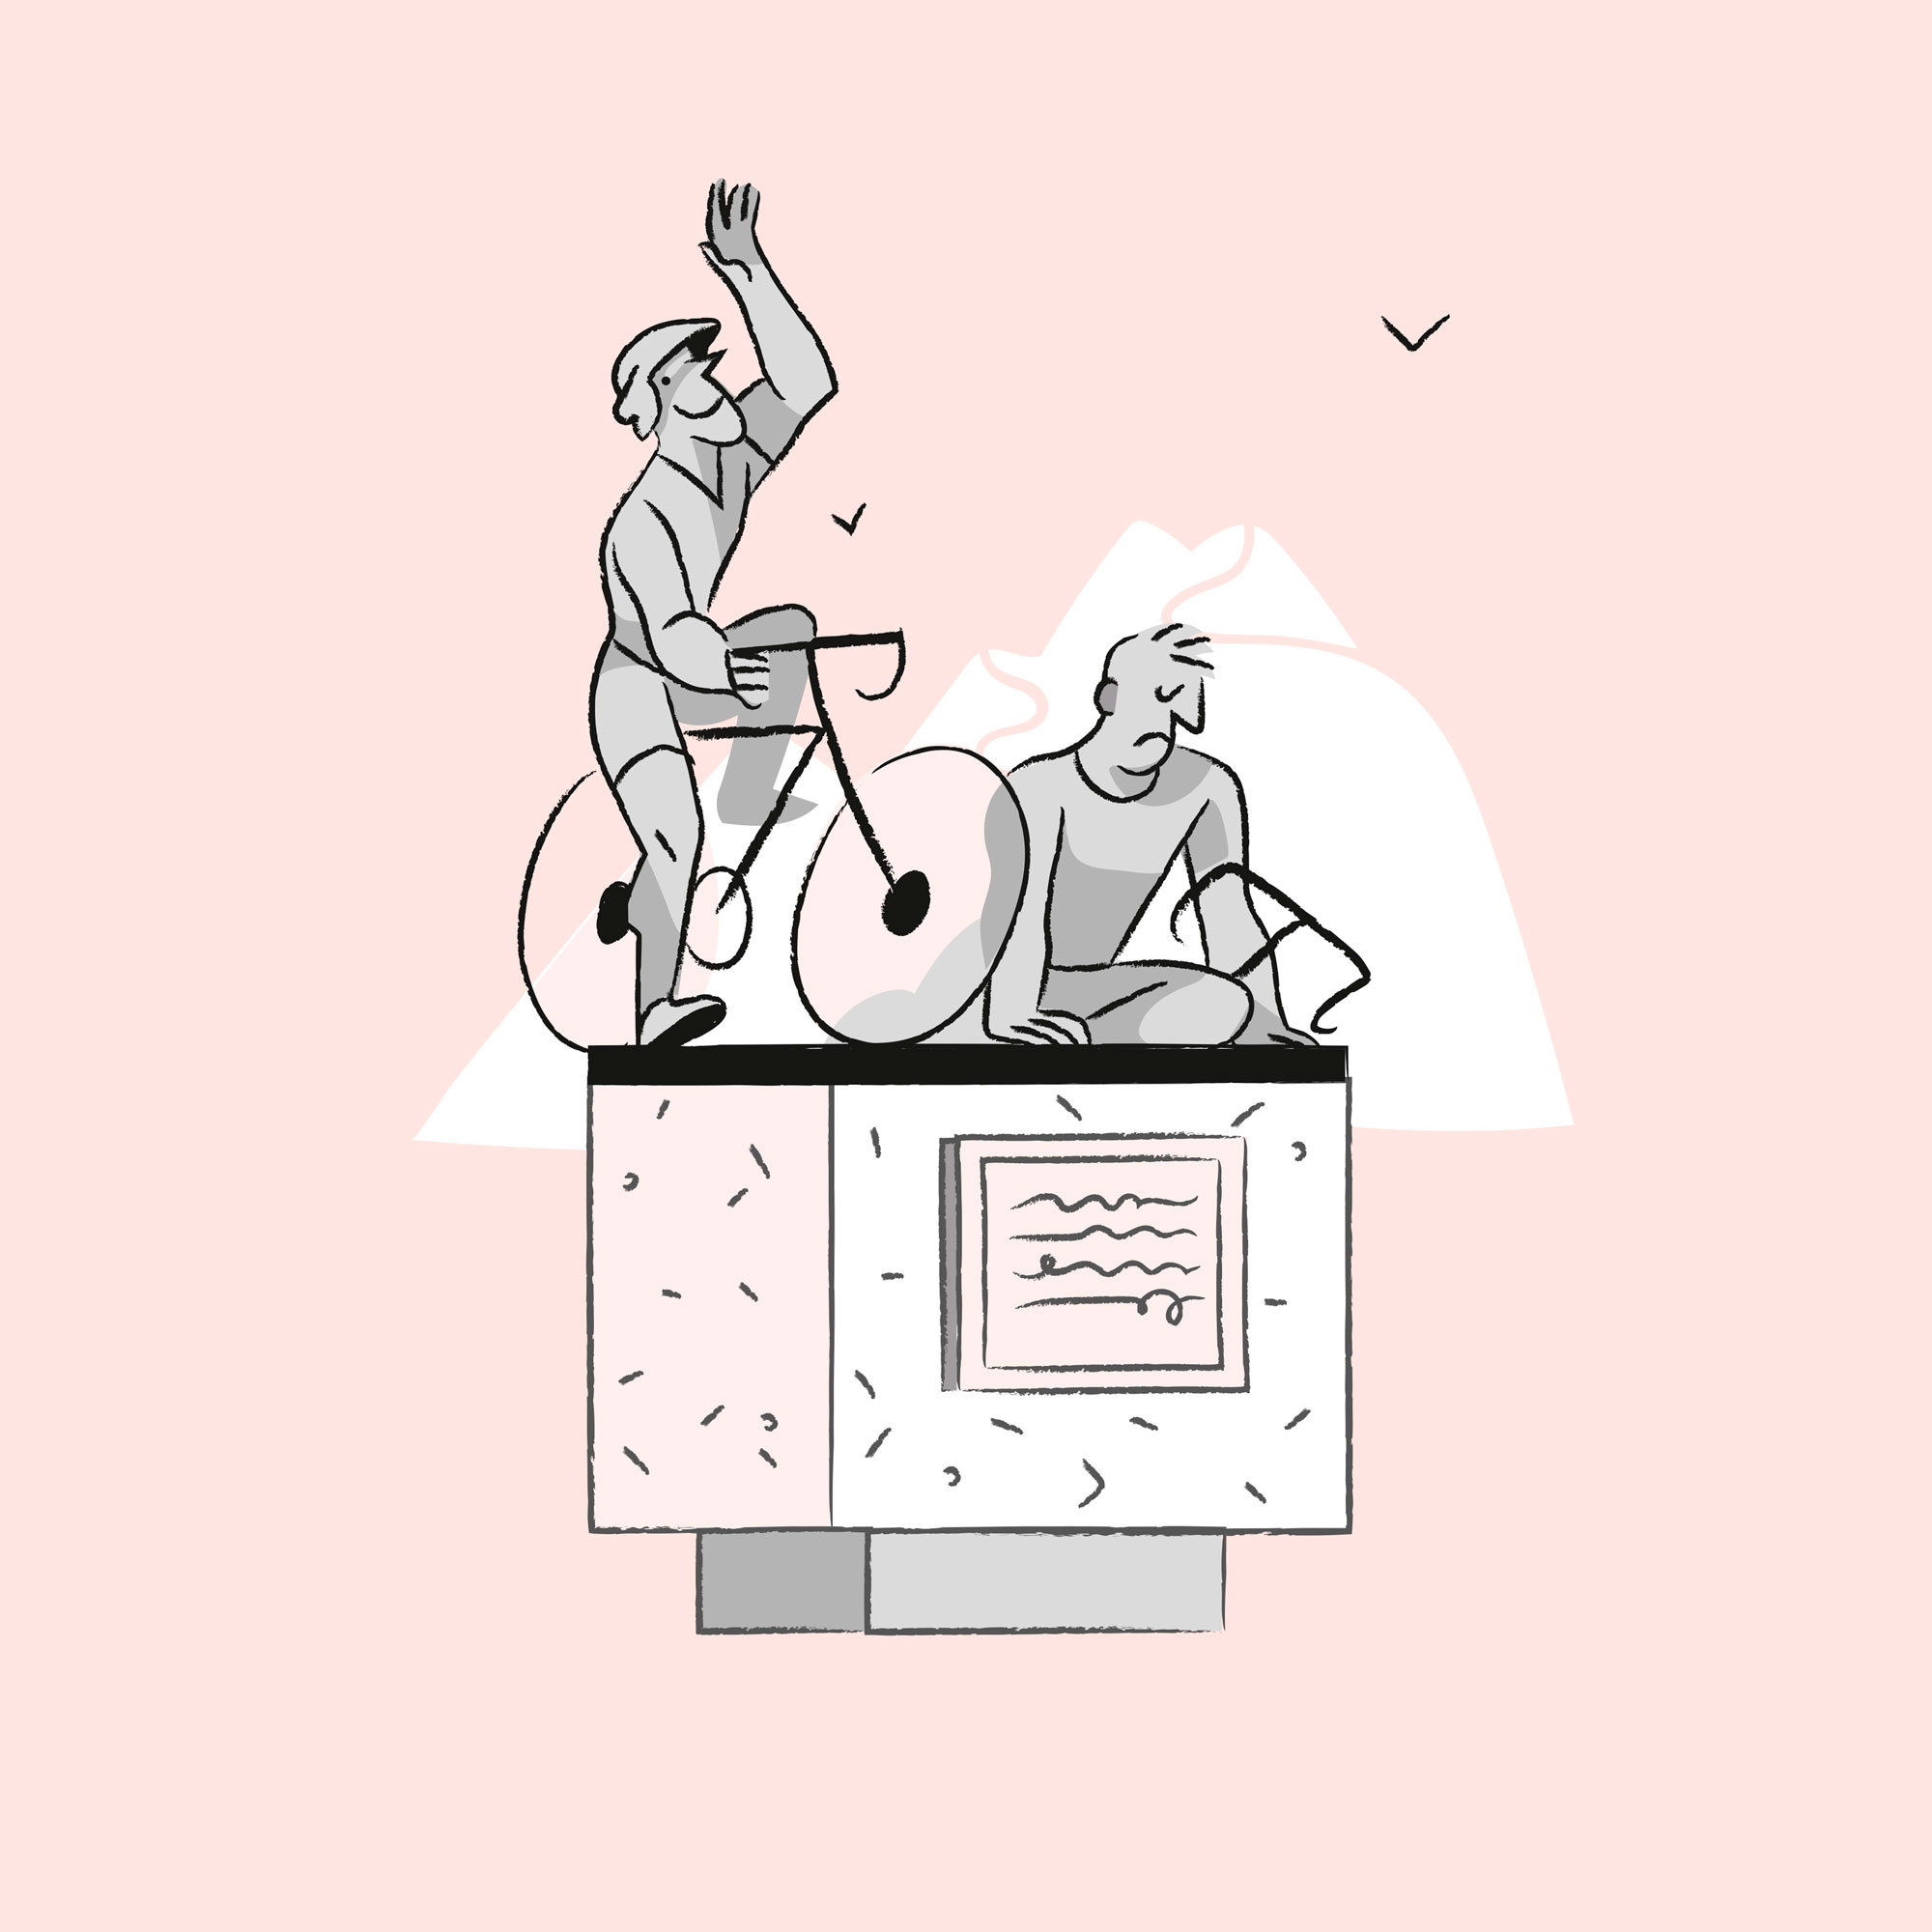 Ciclostile - Monumenti ai ciclisti